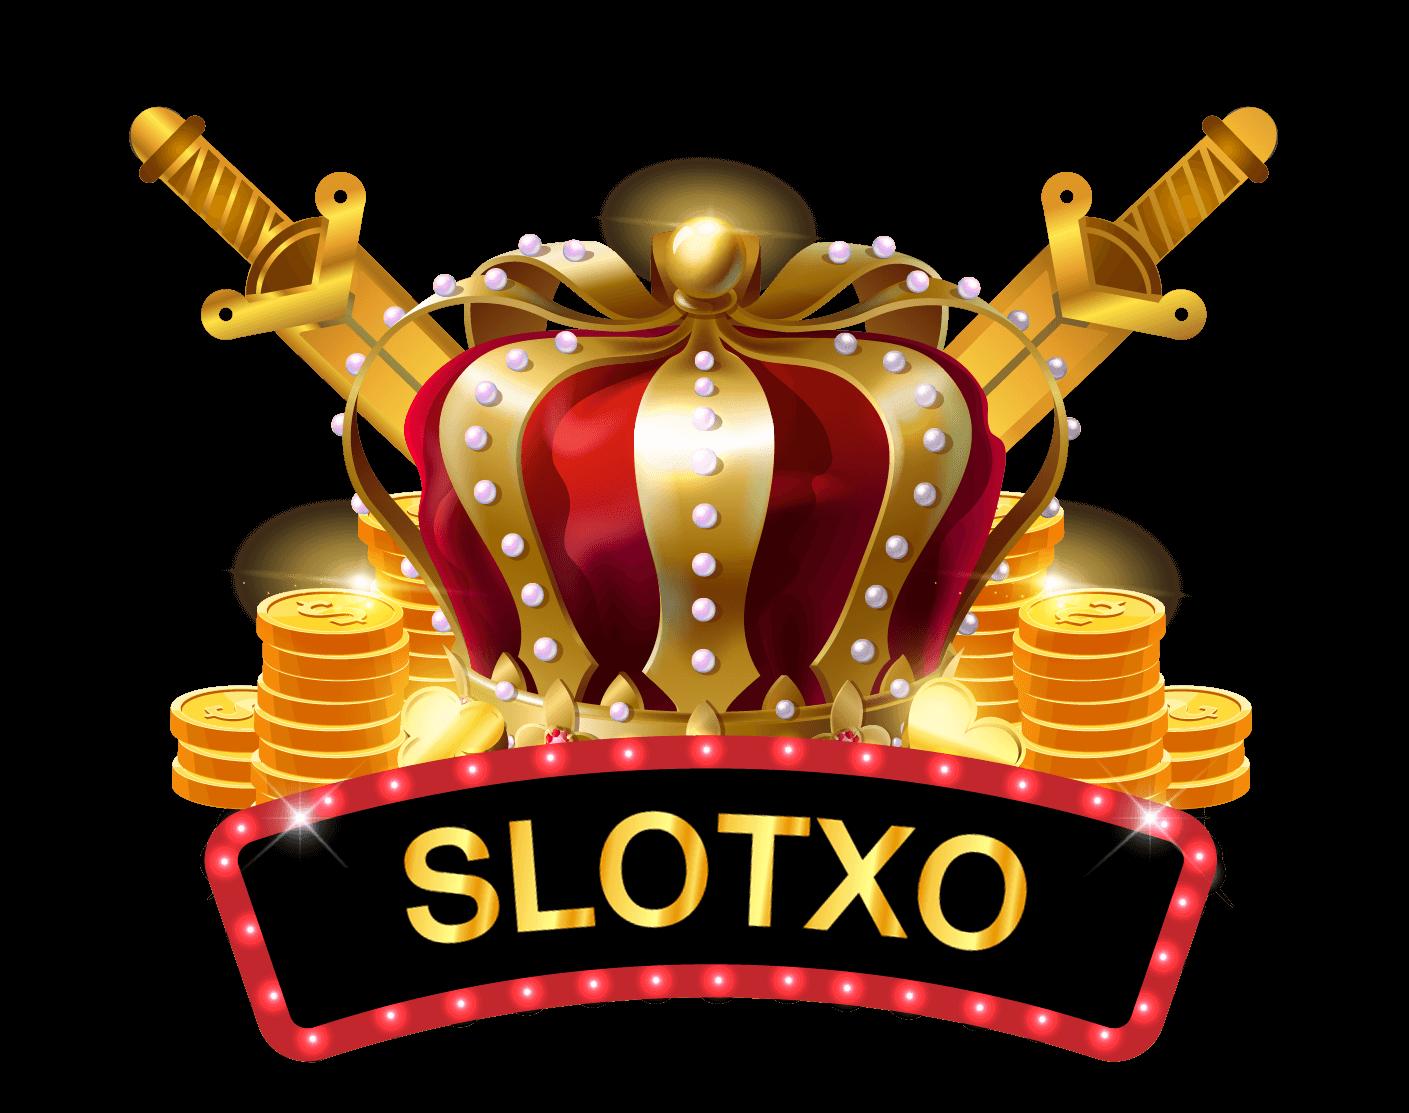 SLOTXO | SLOT918XO ศูนย์รวมสล็อตจากค่ายดังของประเทศไทย